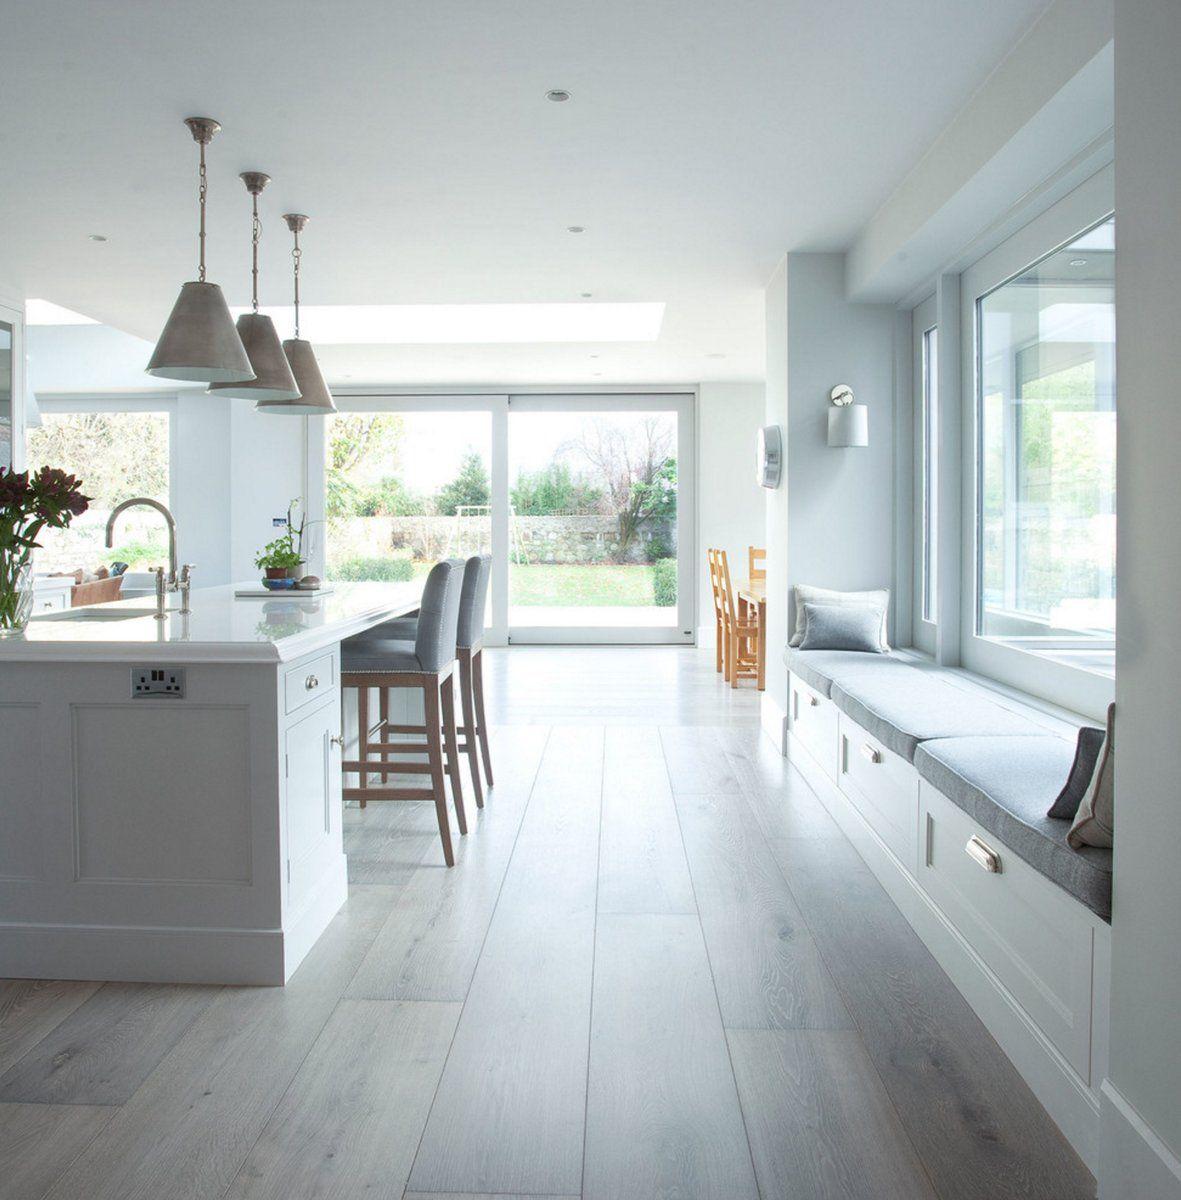 Scandi Inspiration - Beautiful! | Shaxlee\'s Scrumptious kitchens ...